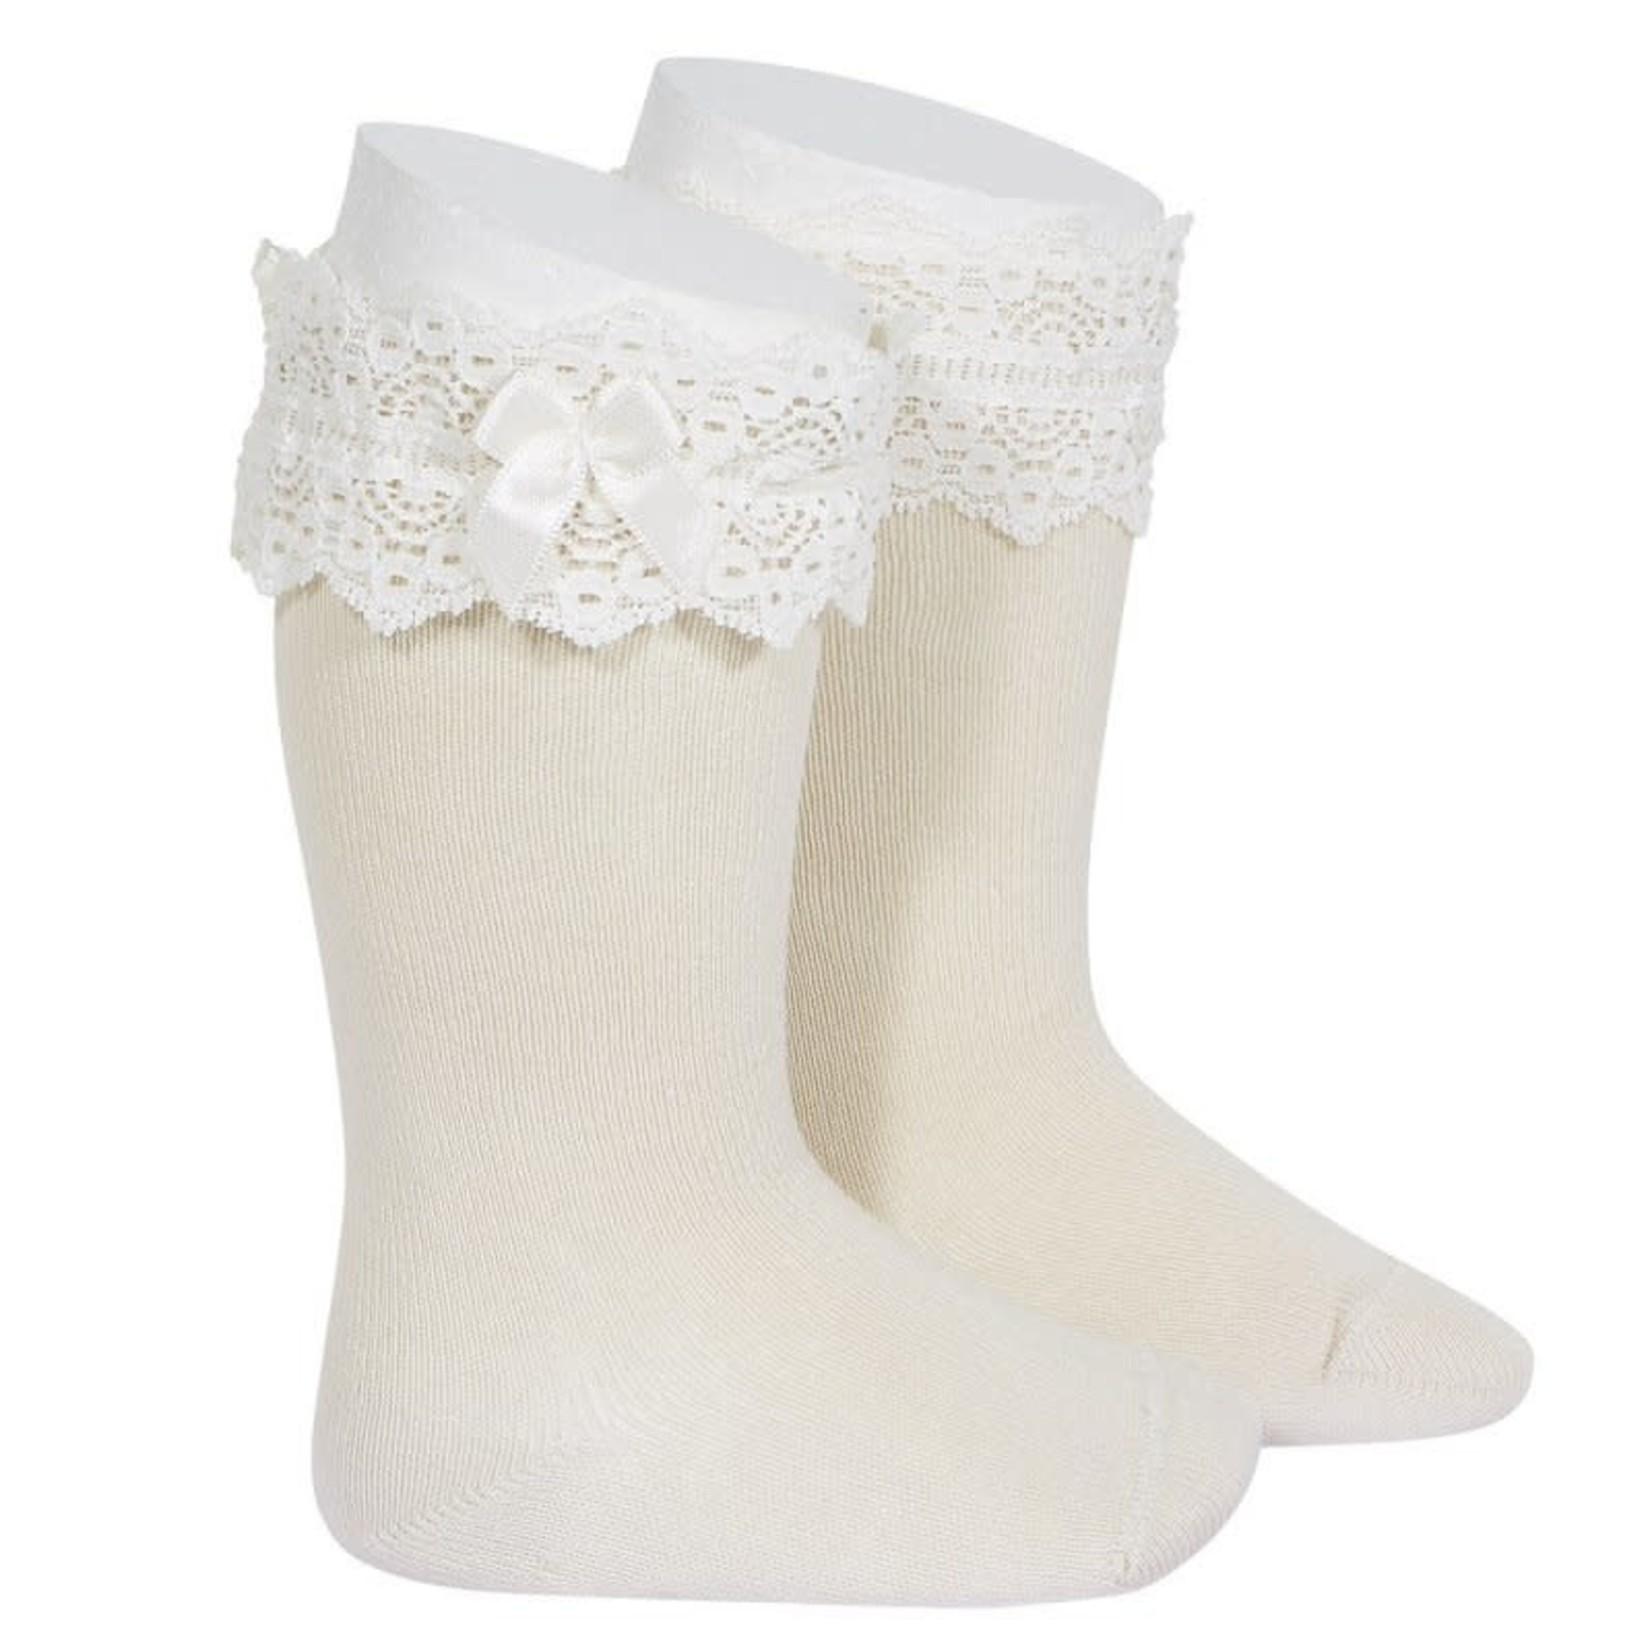 Condor Fantasy Socks Knee High - Lino